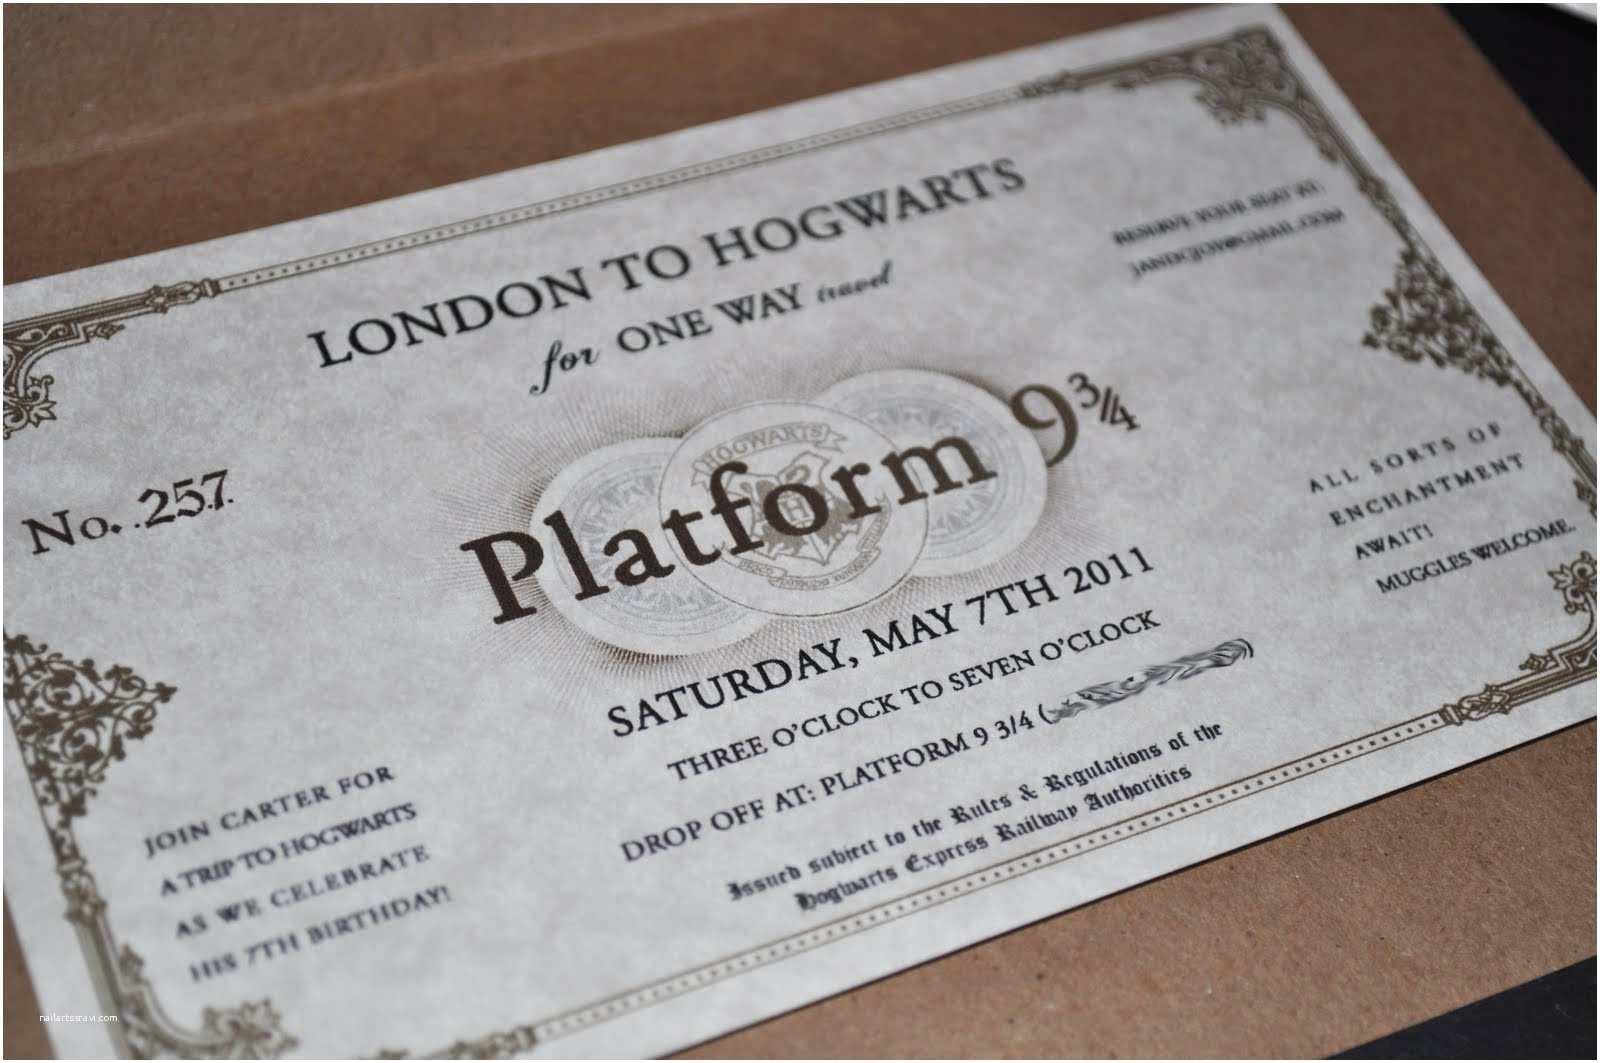 Harry Potter Party Invitations Serendipity Design Studio Sneak Peek the Final